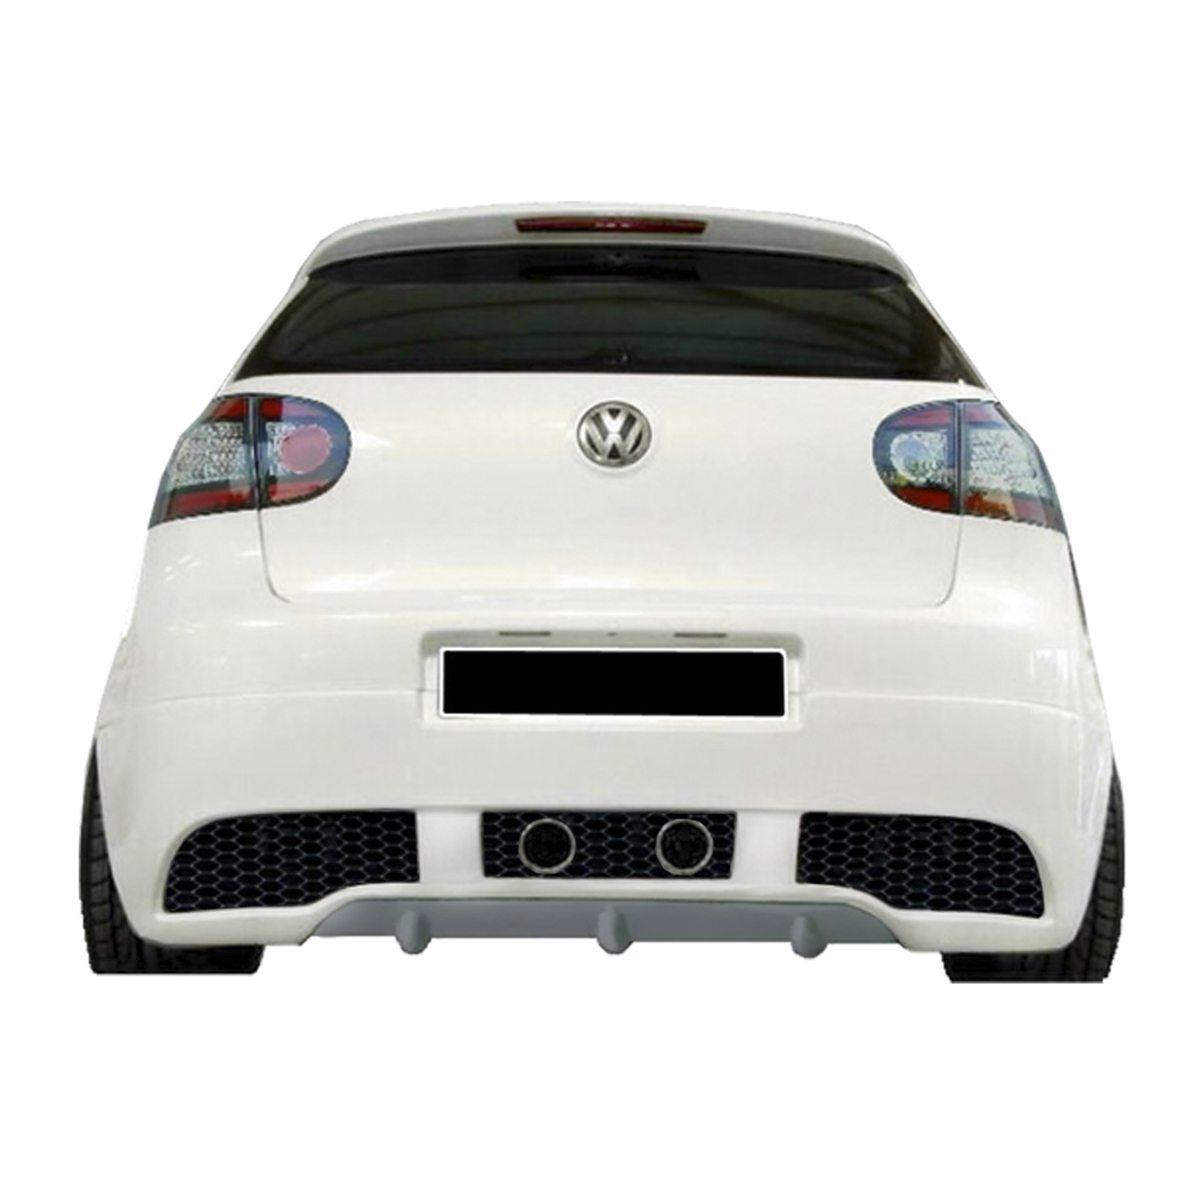 VW-Golf-V-Power-Tras-PCF018